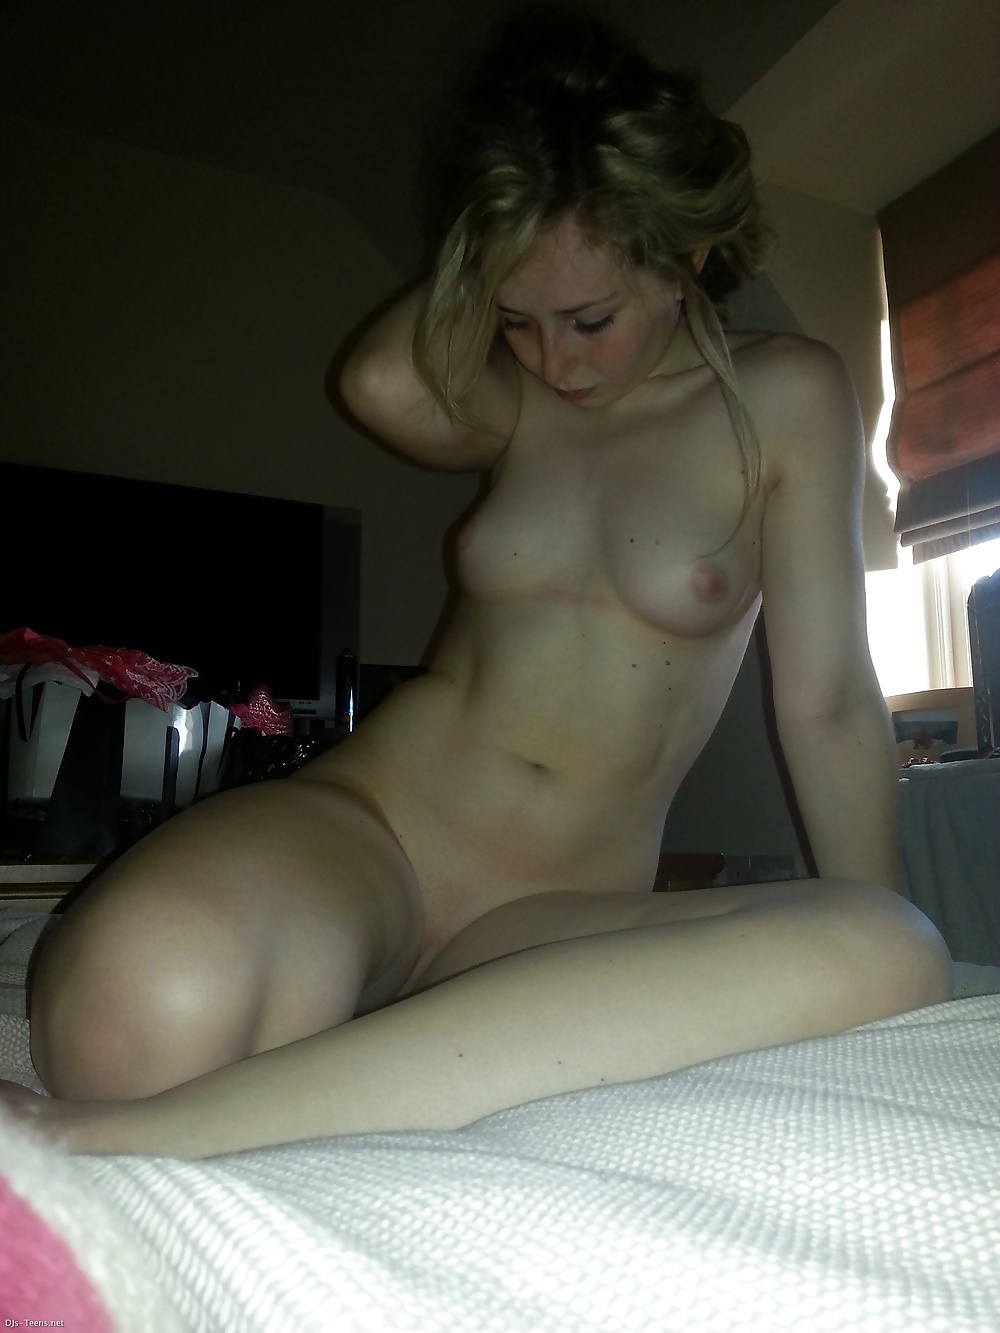 Indu girl sex pics